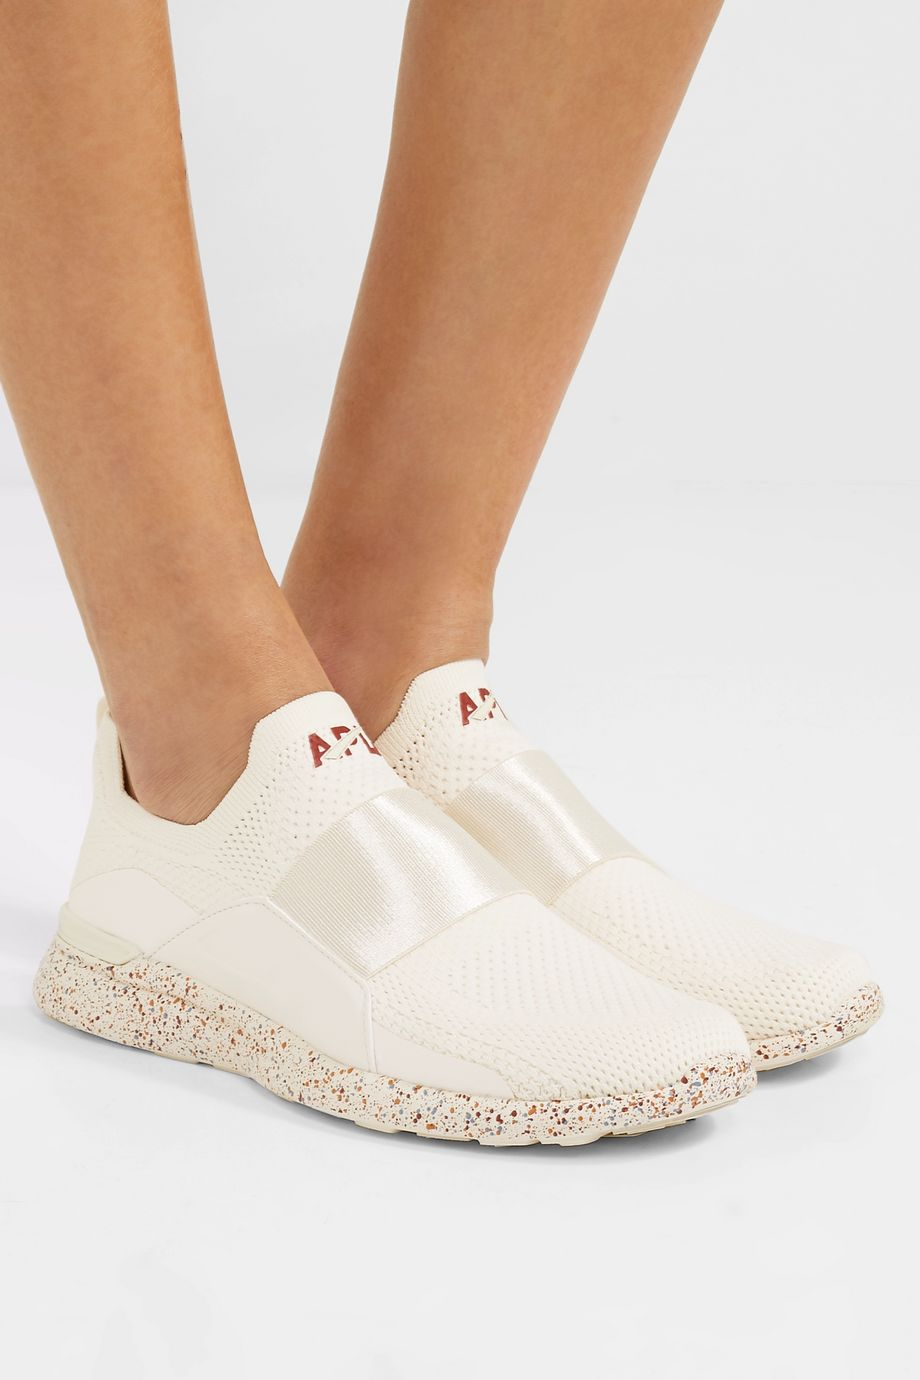 APL Athletic Propulsion Labs TechLoom Bliss mesh and neoprene sneakers